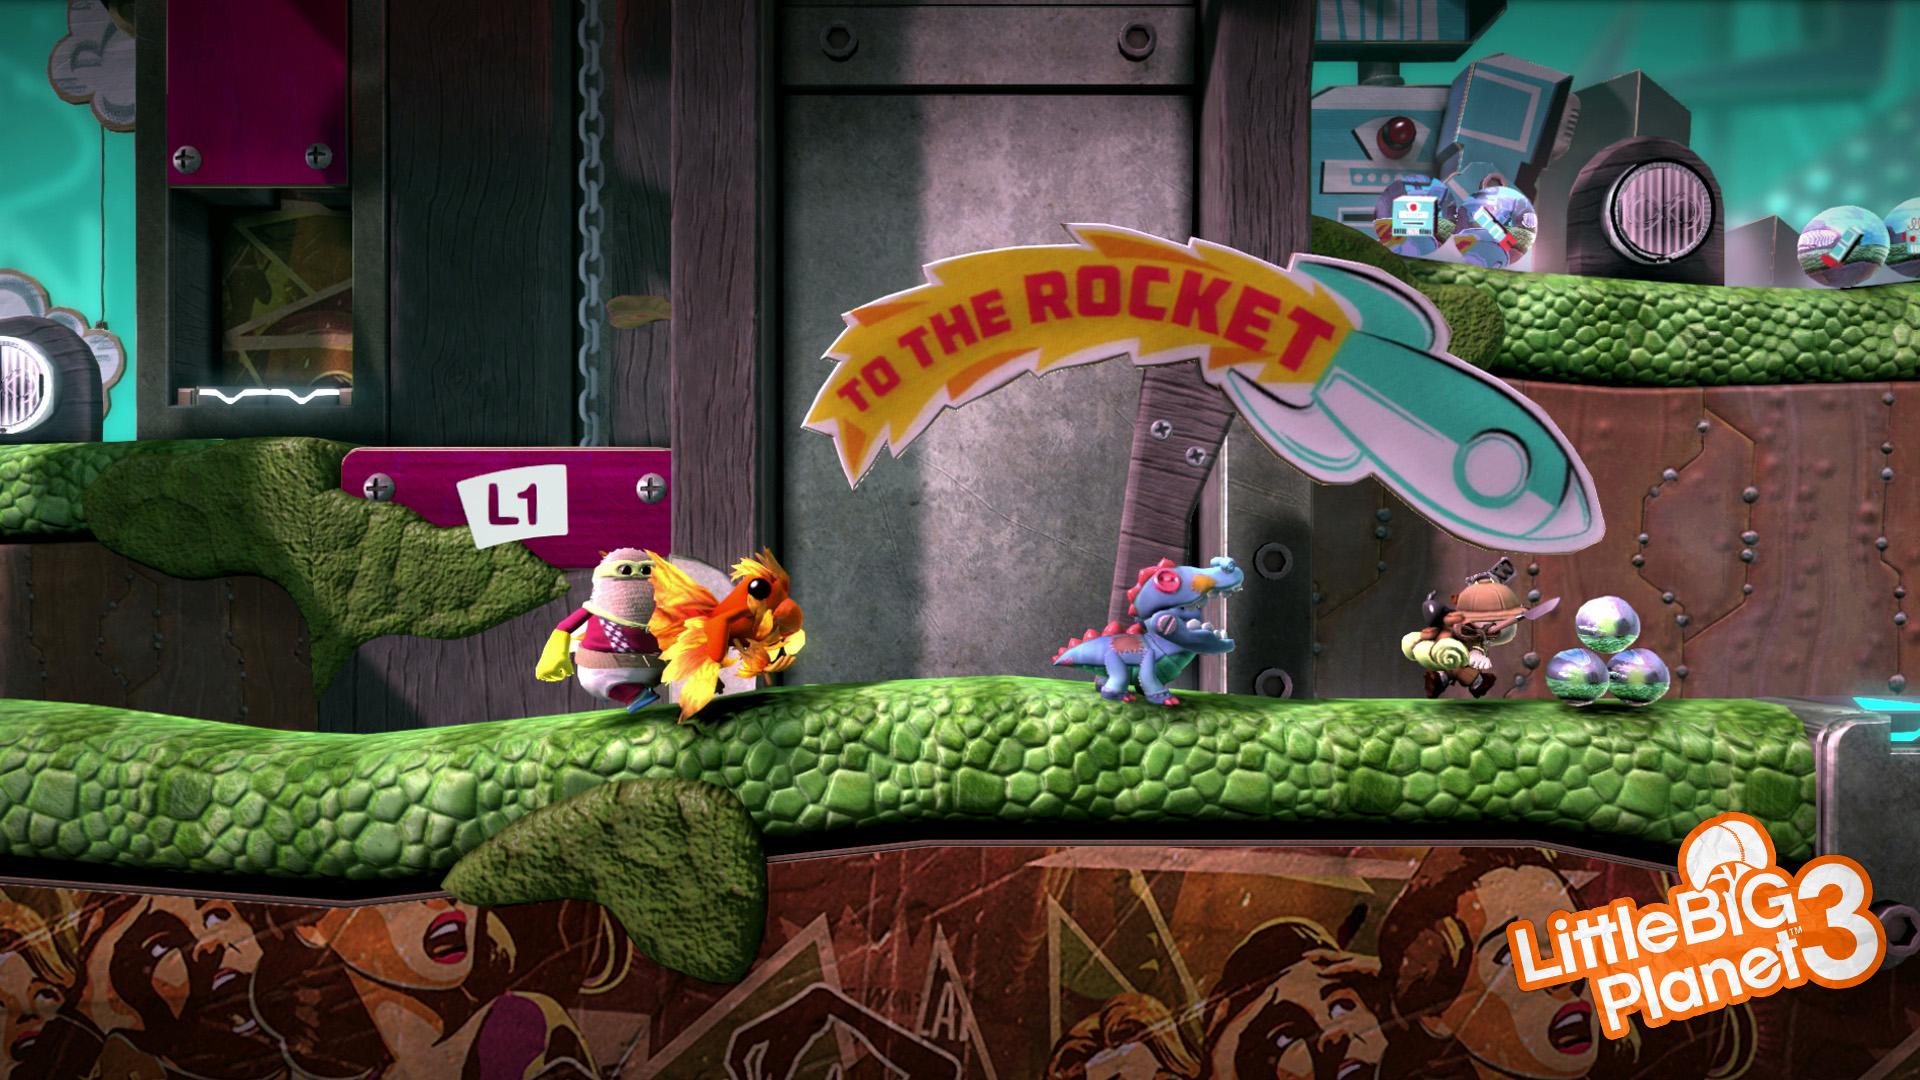 LittleBigPlanet3 PS4 Editeur 015